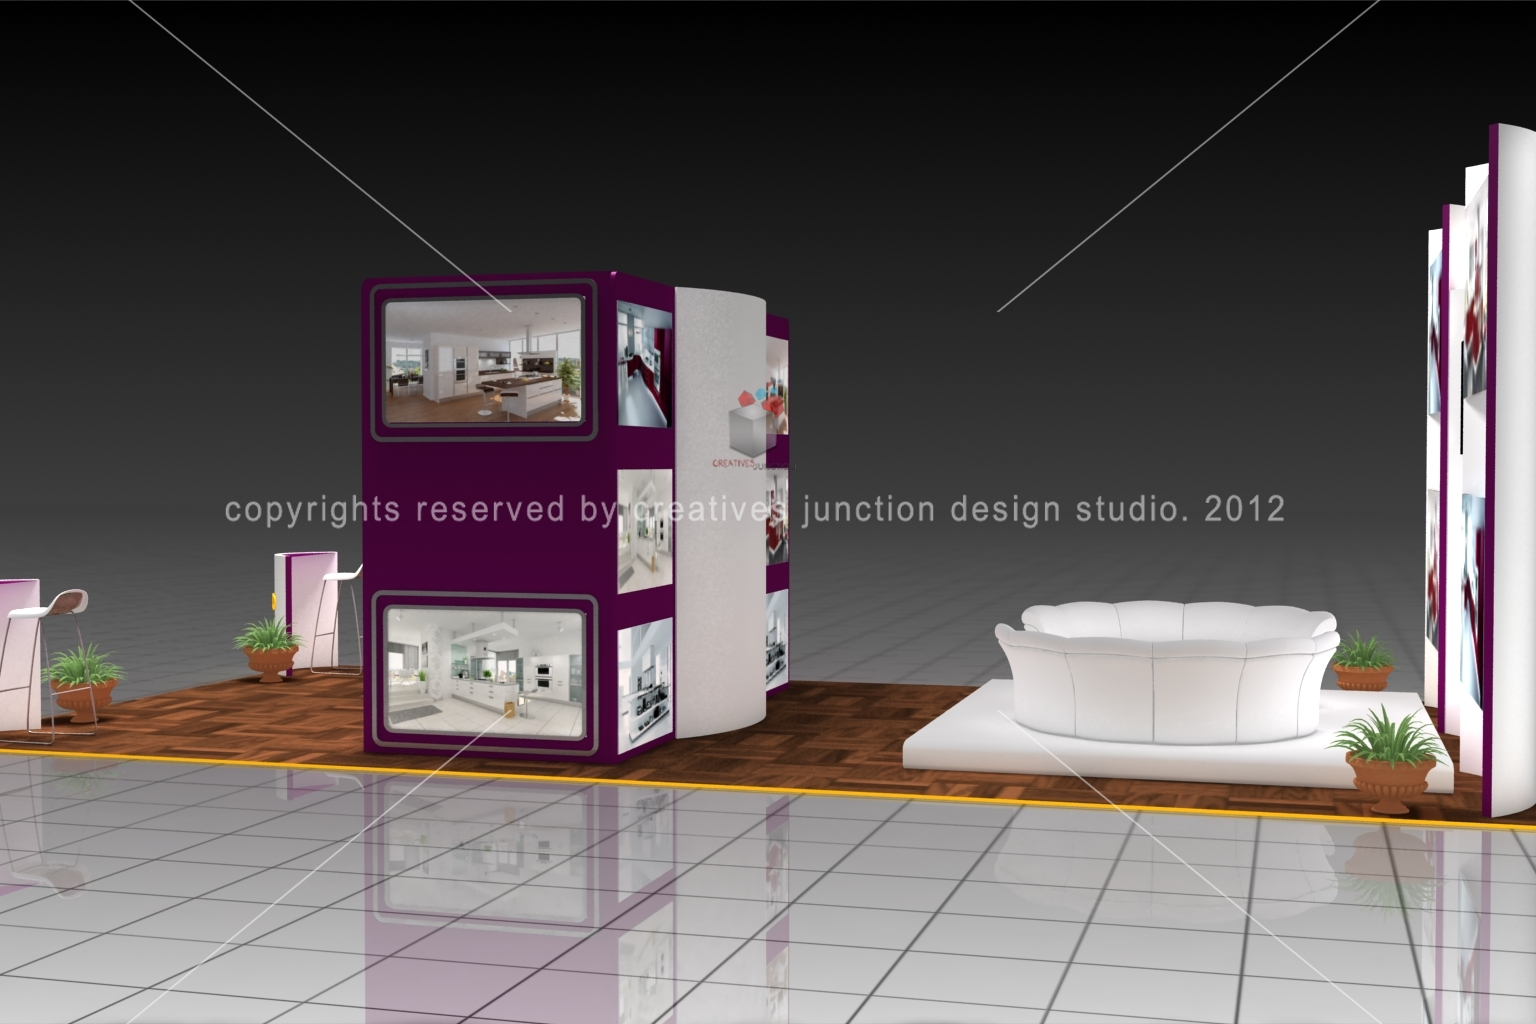 Exhibition Stand Design Decor : Creatives junction design studio home decor exhibition stand